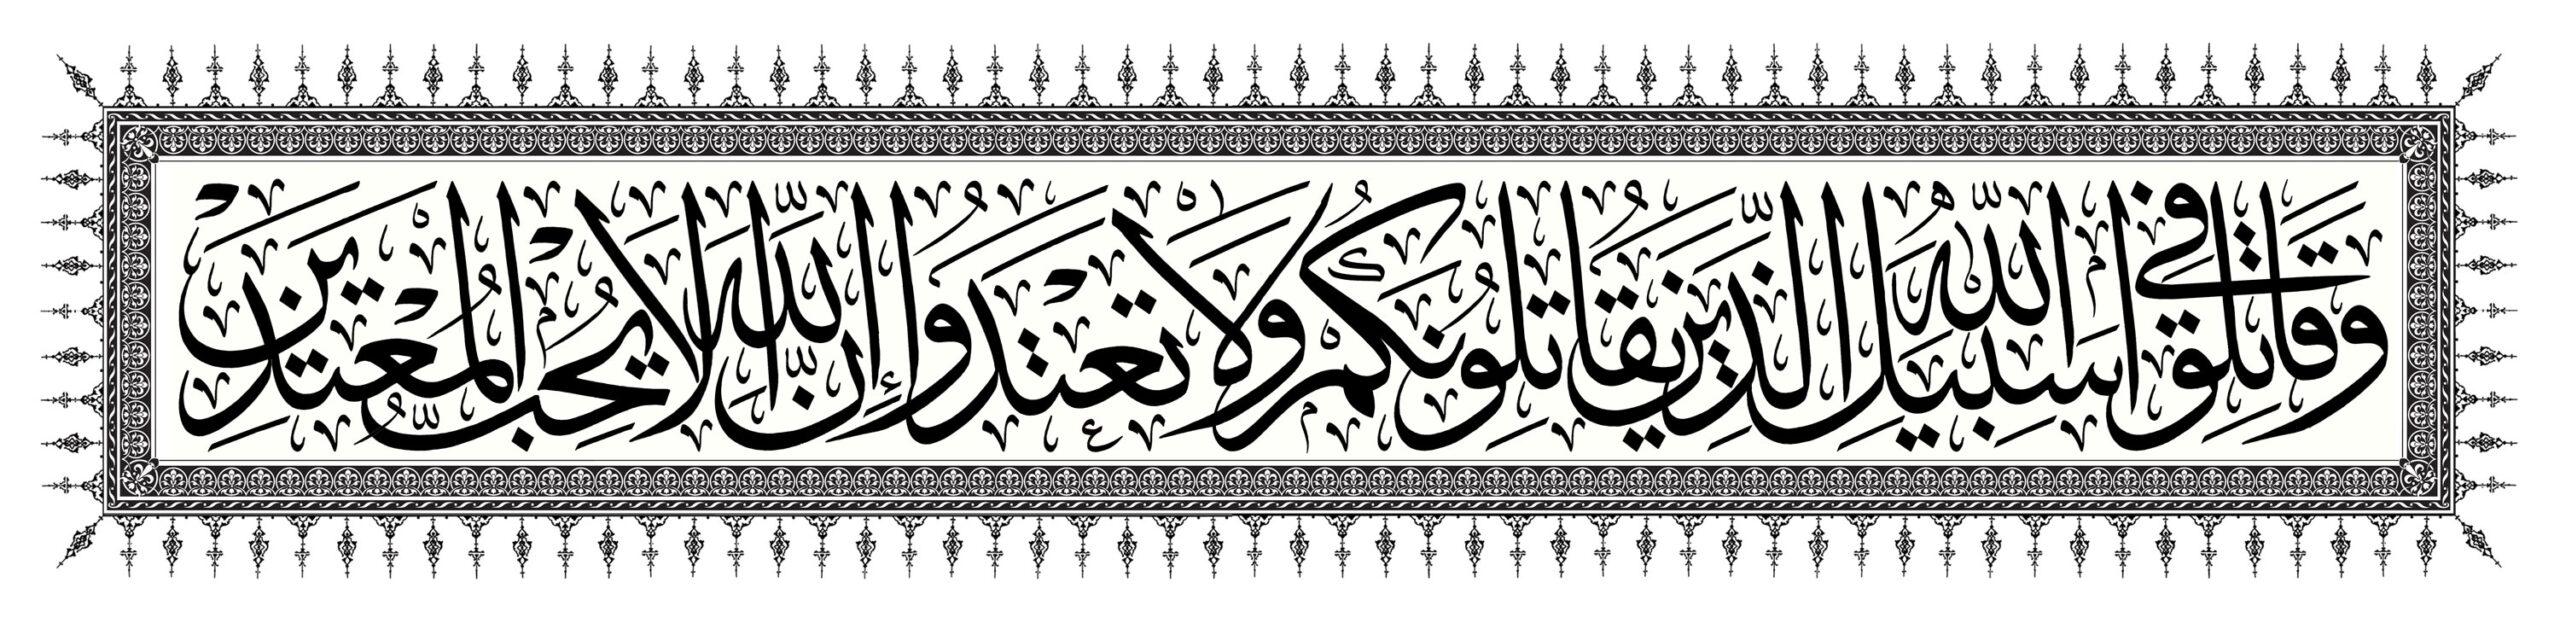 2190 Al Baqara White